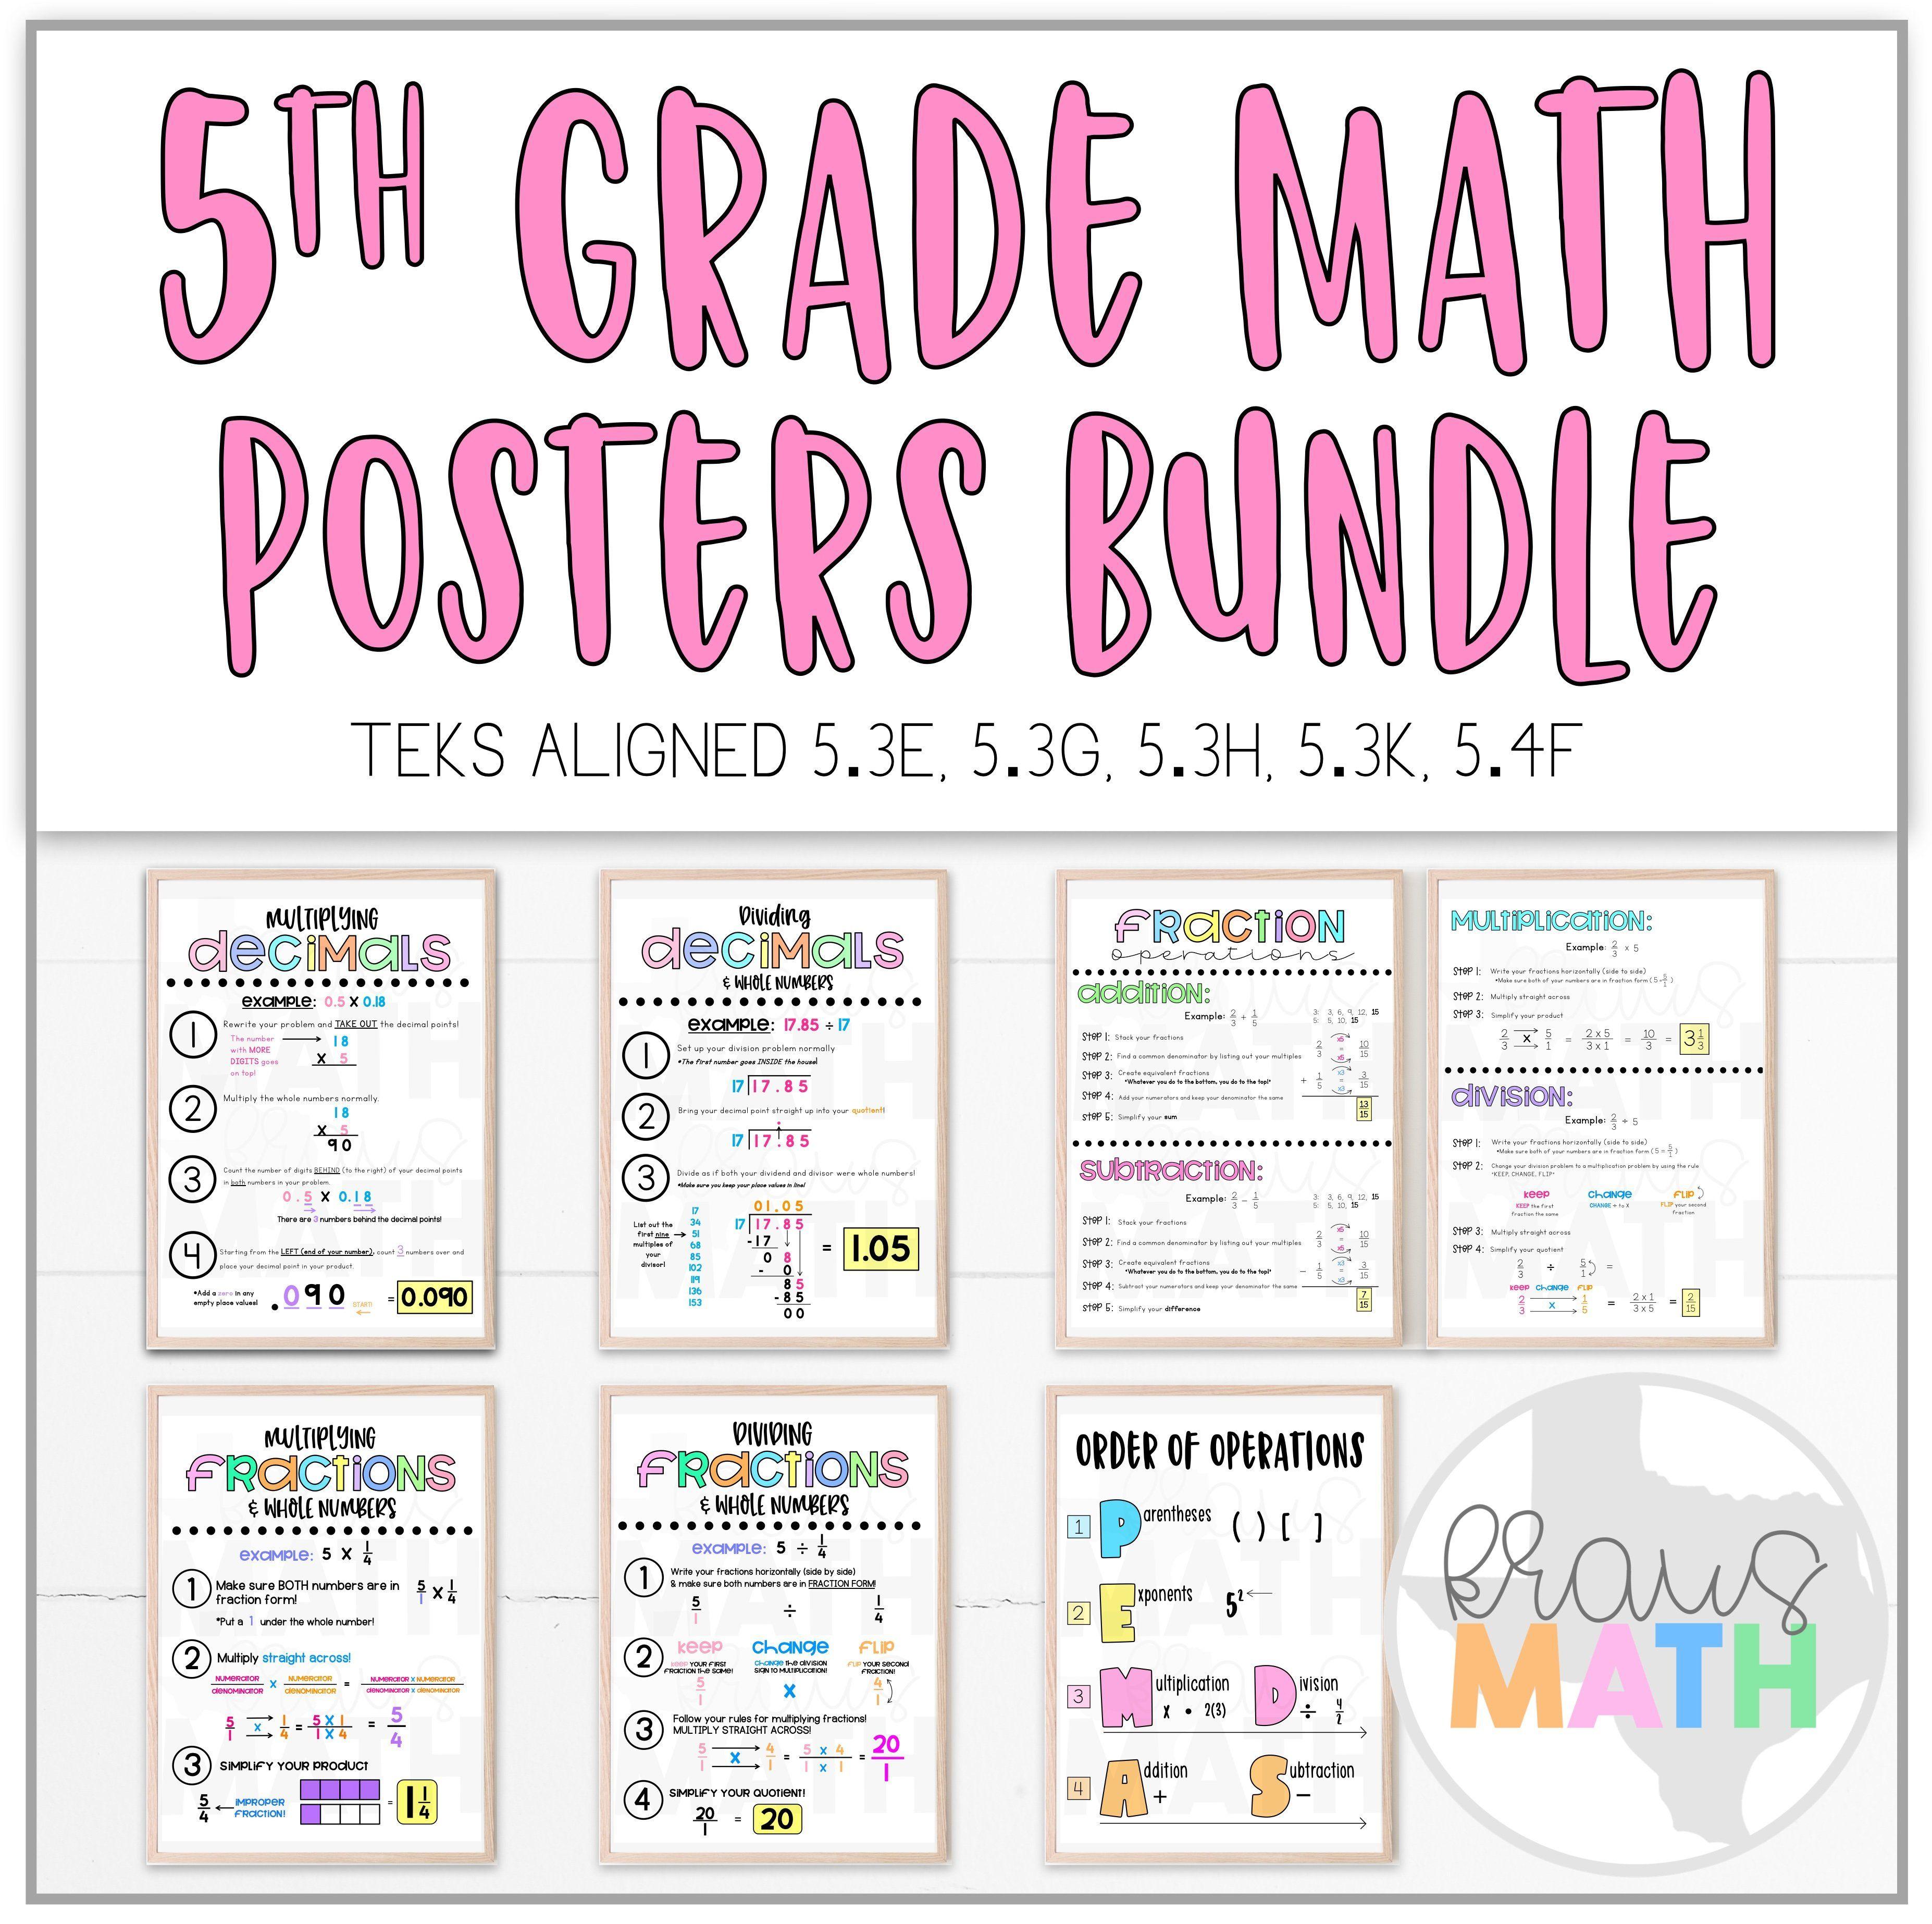 5th Grade Math Posters Bundle